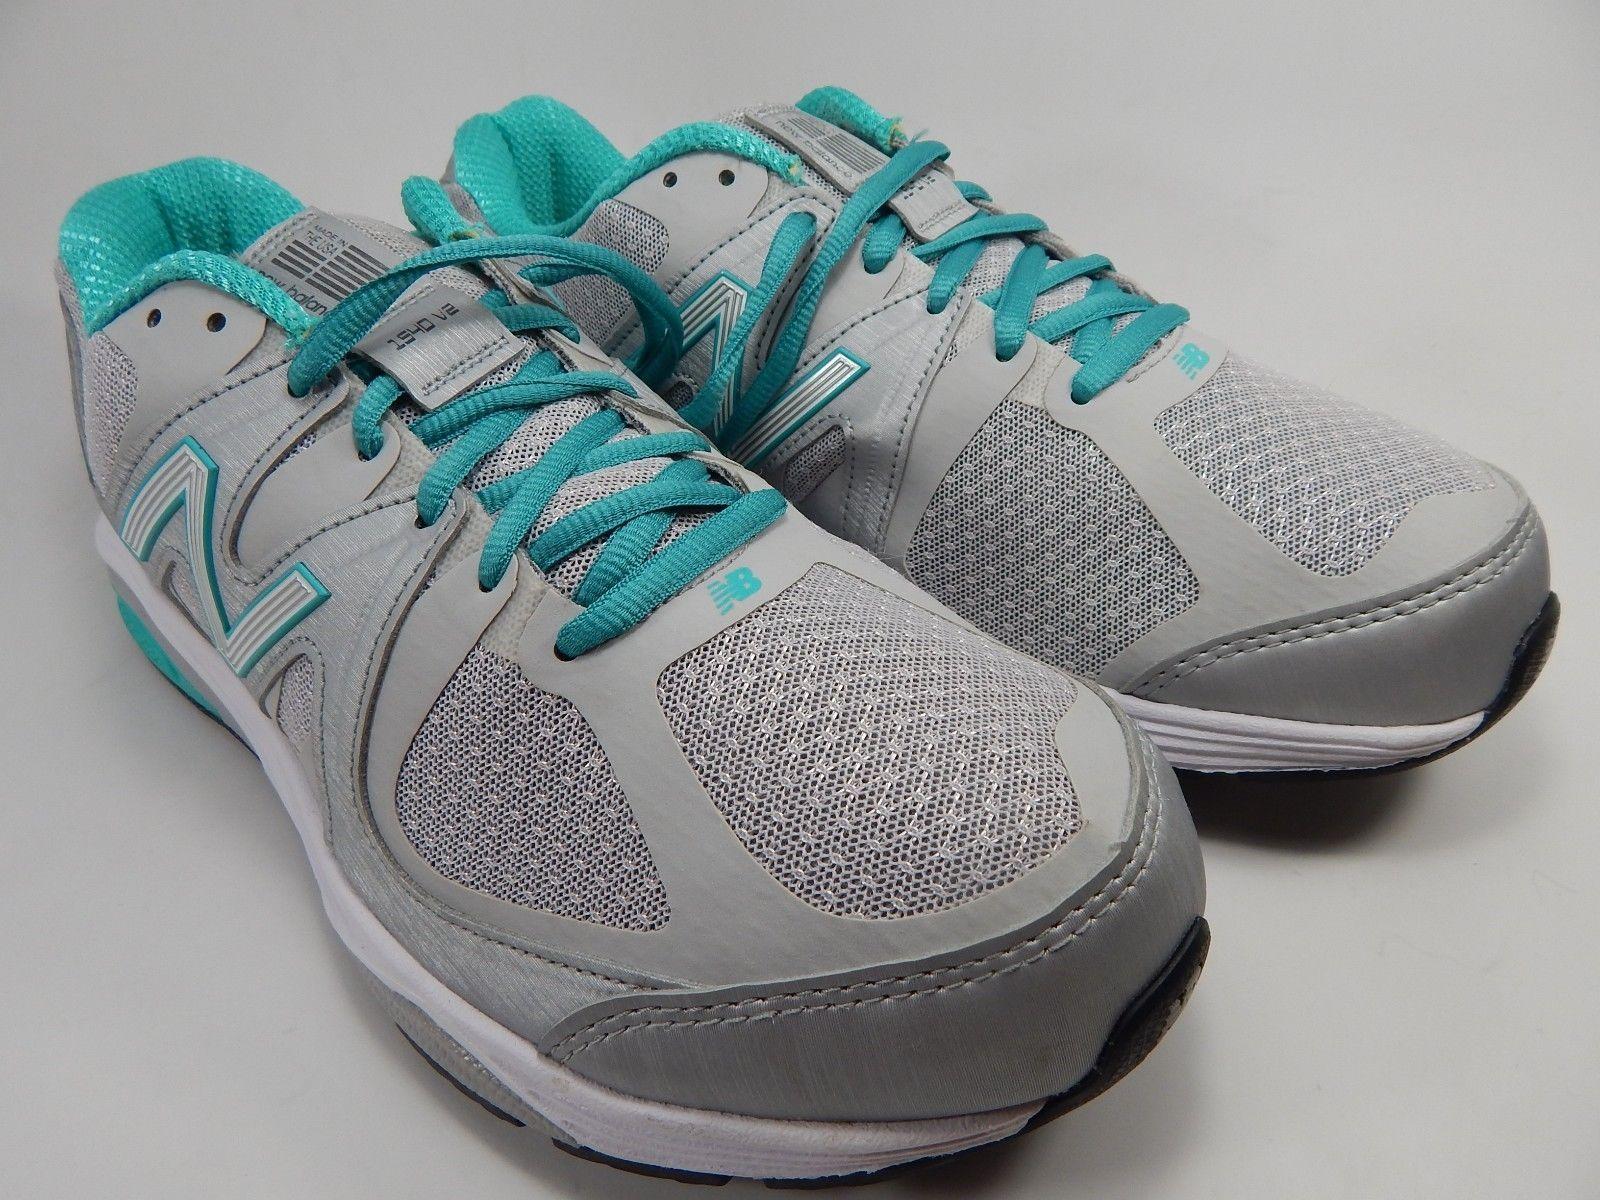 New Balance 1540 v2 Women's Running Shoes Size US 10.5 D WIDE EU 42.5 W1540SG2 image 2